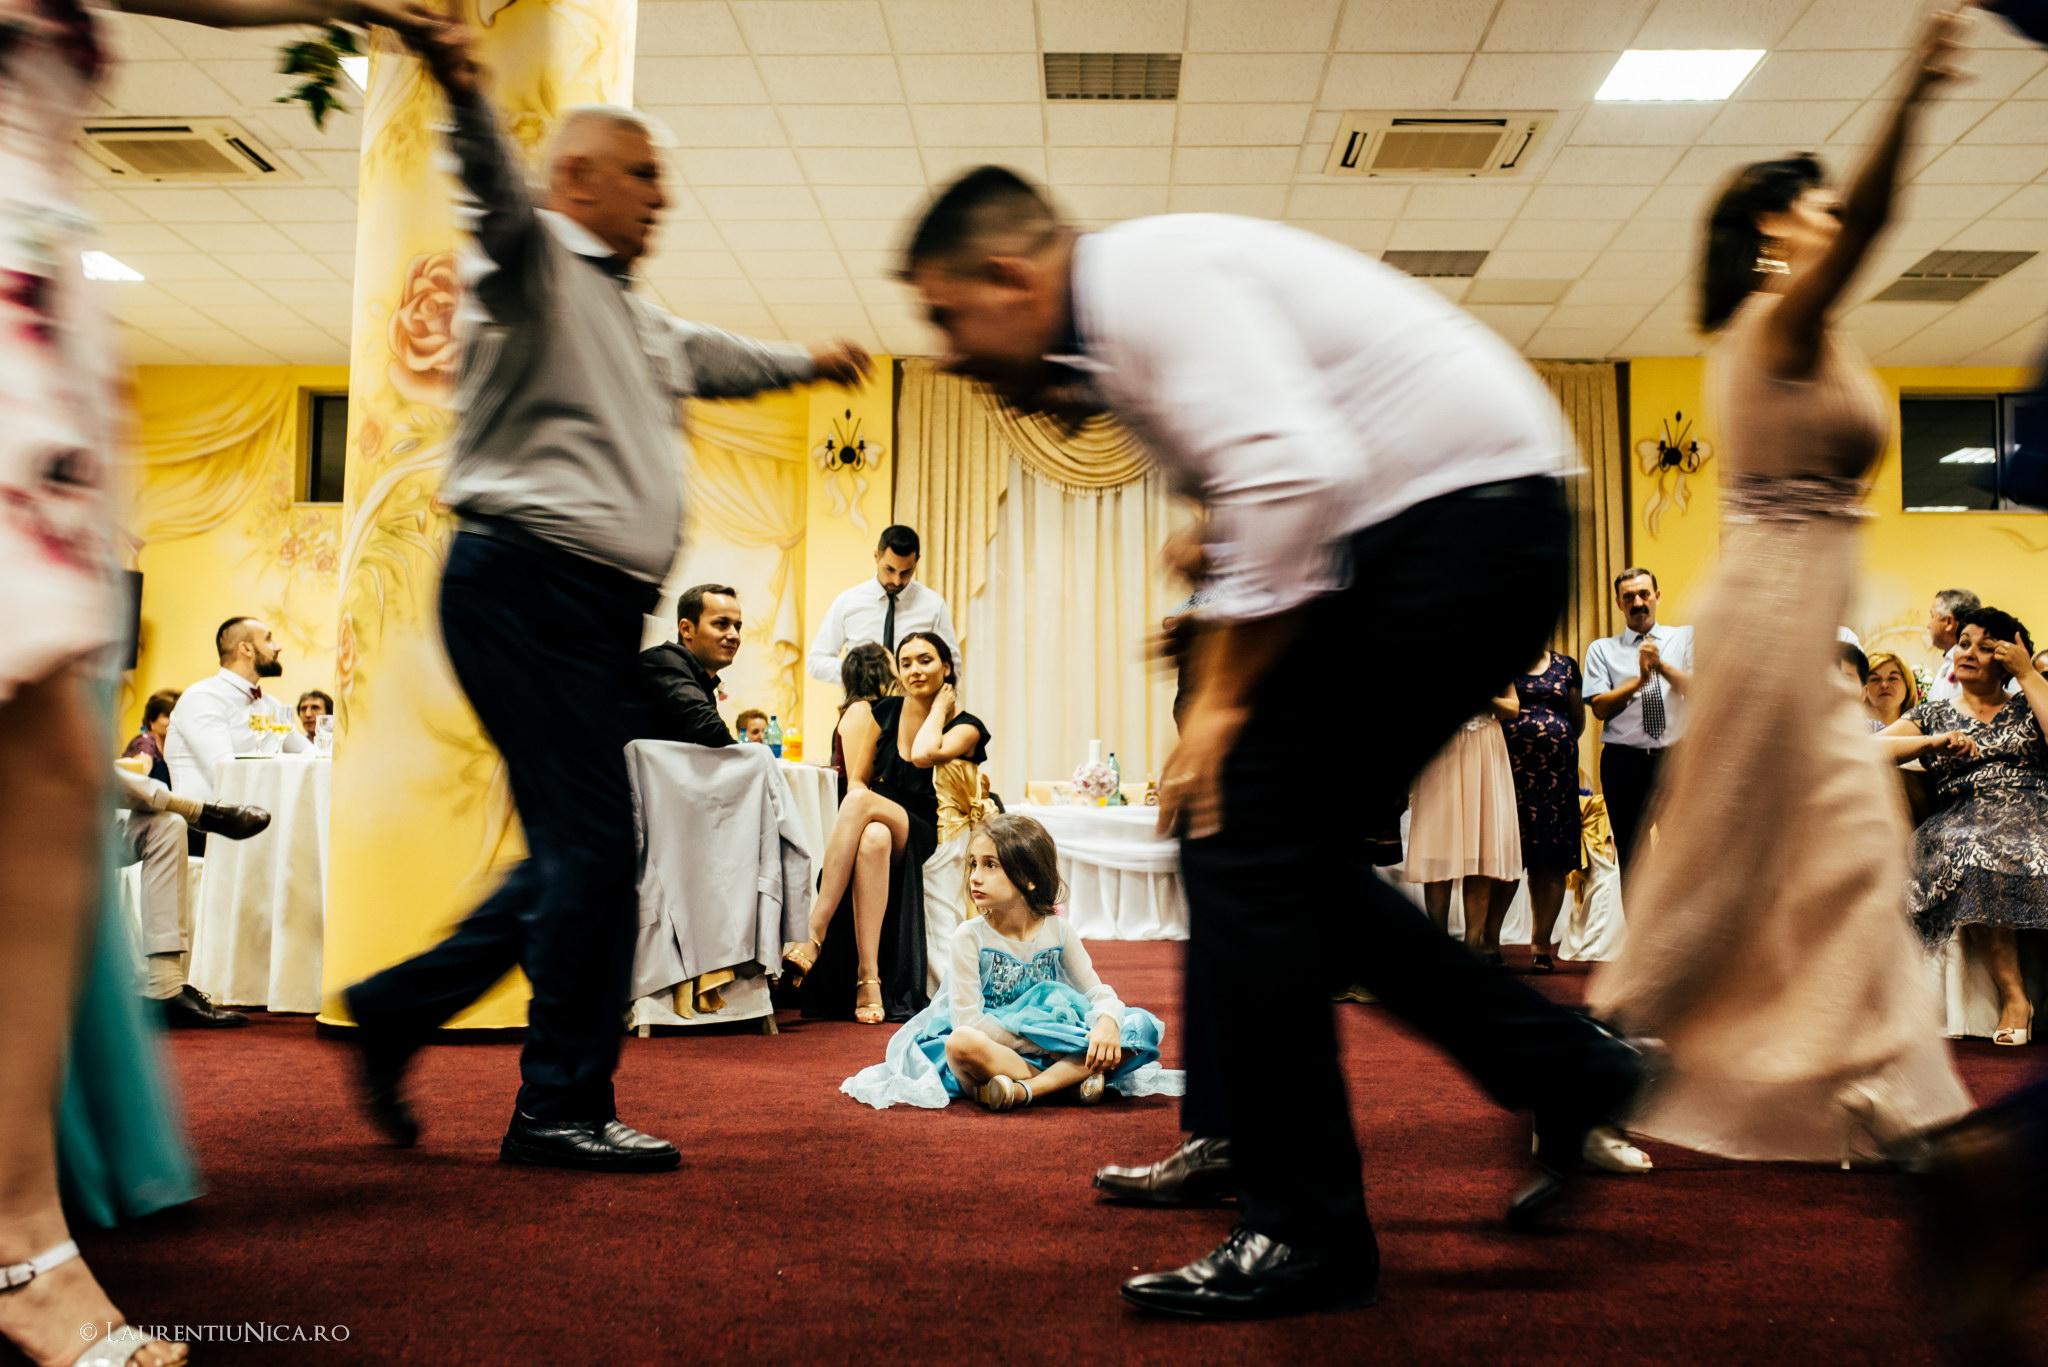 daiana si madalin fotograf nunta laurentiu nica targu jiu gorj 26 - Daiana & Madalin | Fotografii nunta | Targu-Jiu | Gorj